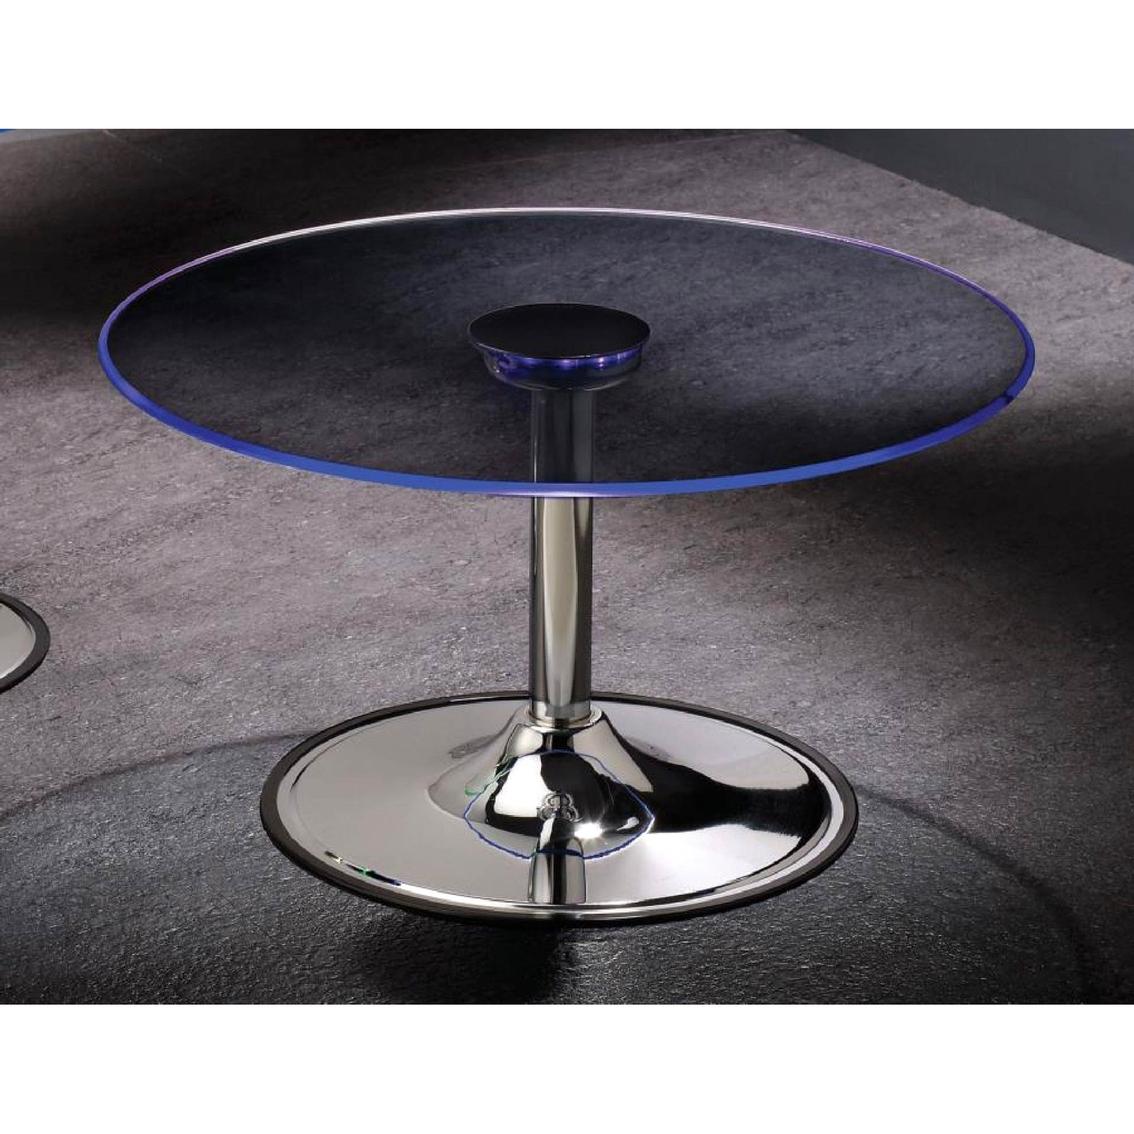 Coaster Led Coffee Table With Chrome Base